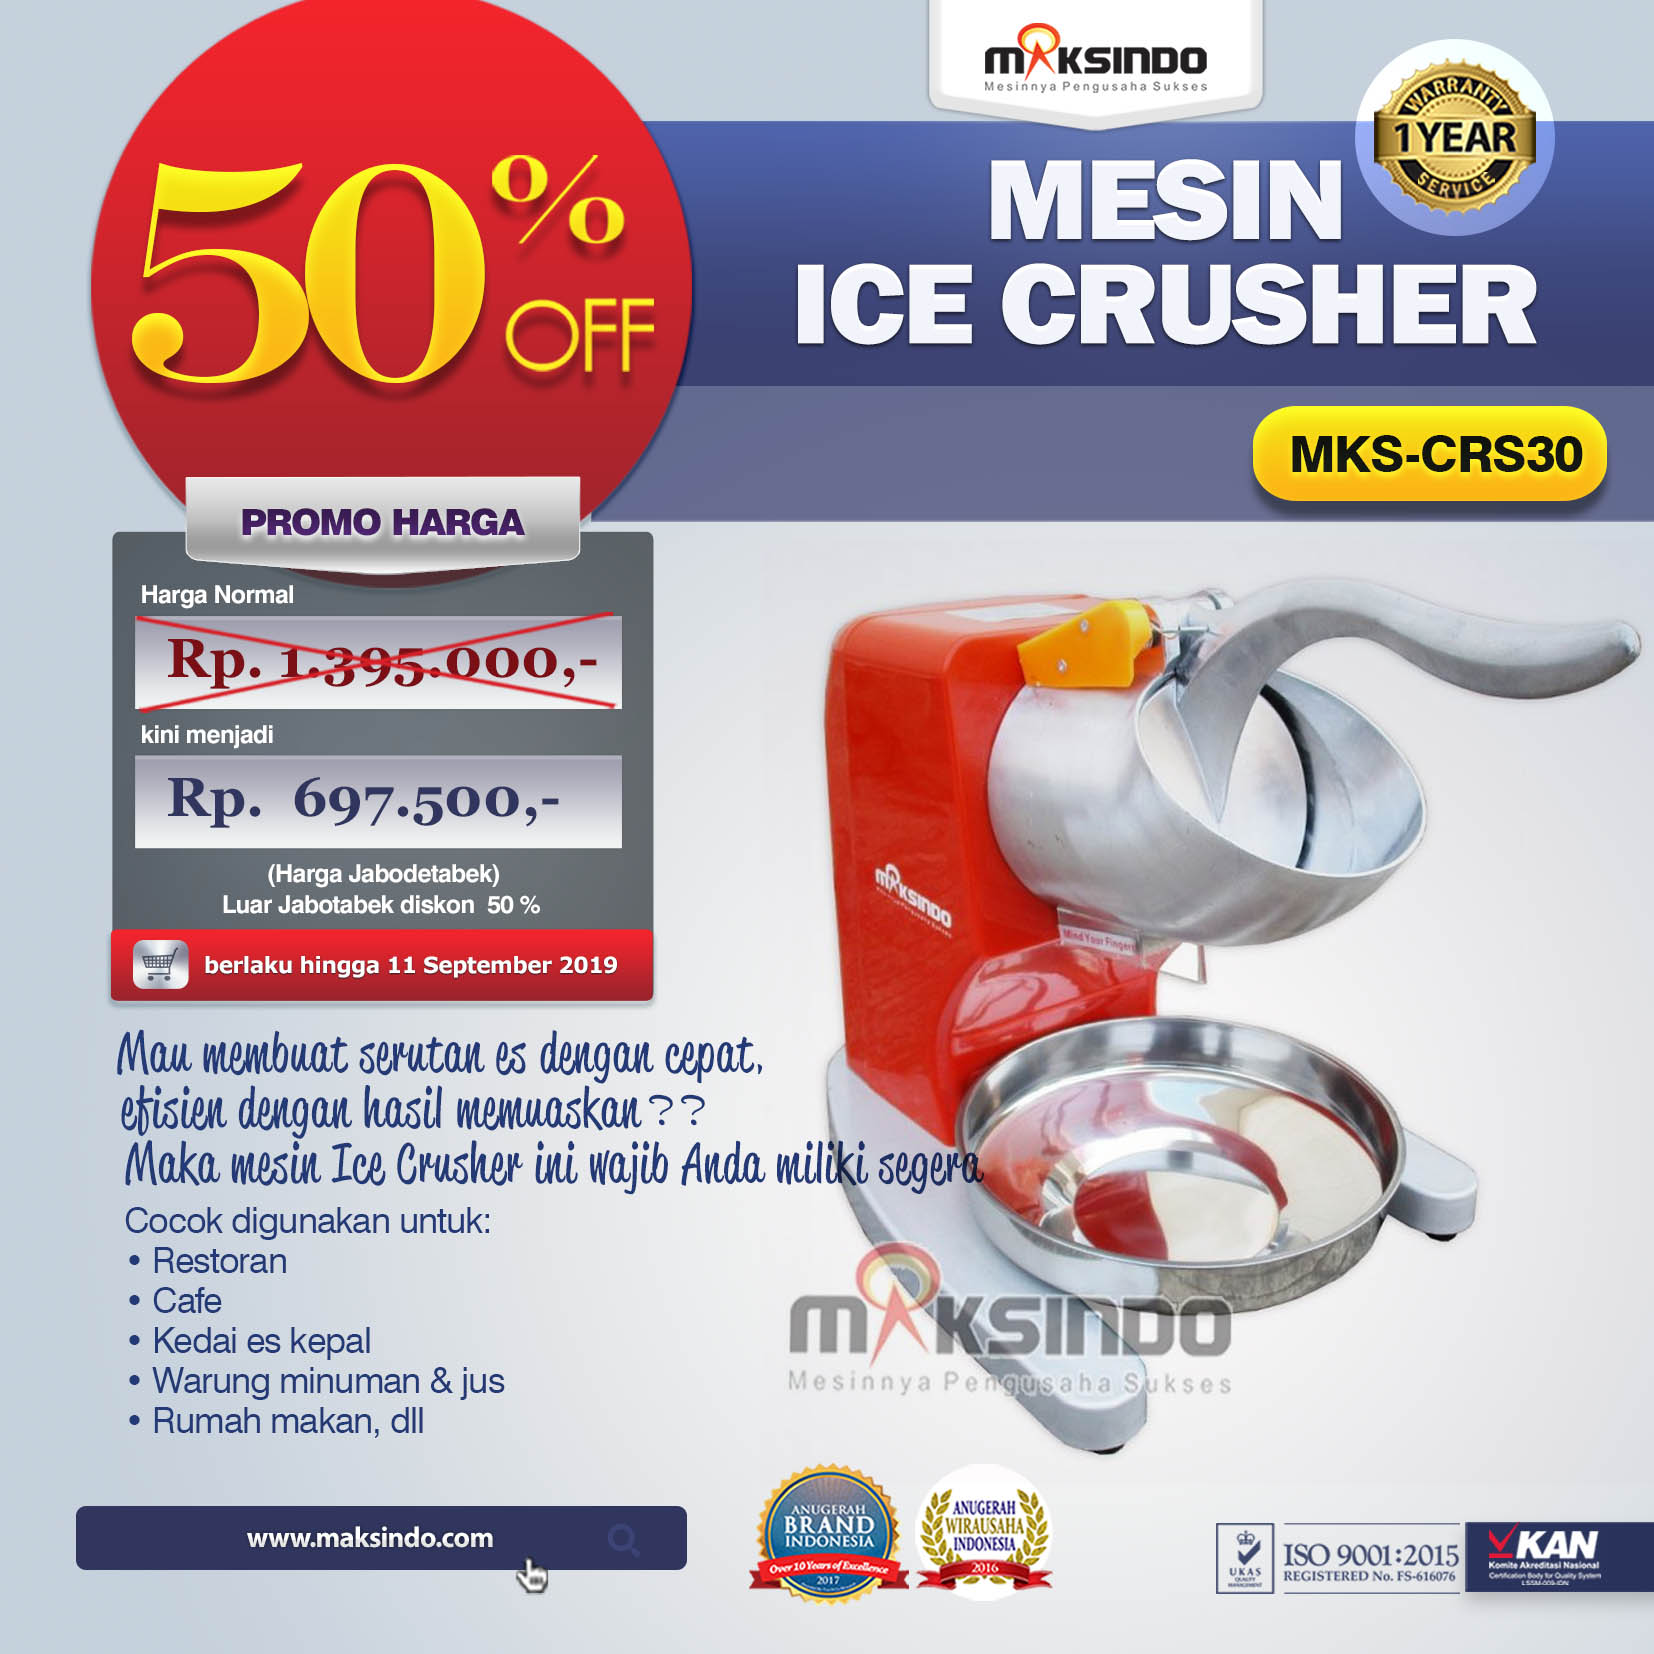 MKS-CRS30 Mesin Ice Crusher